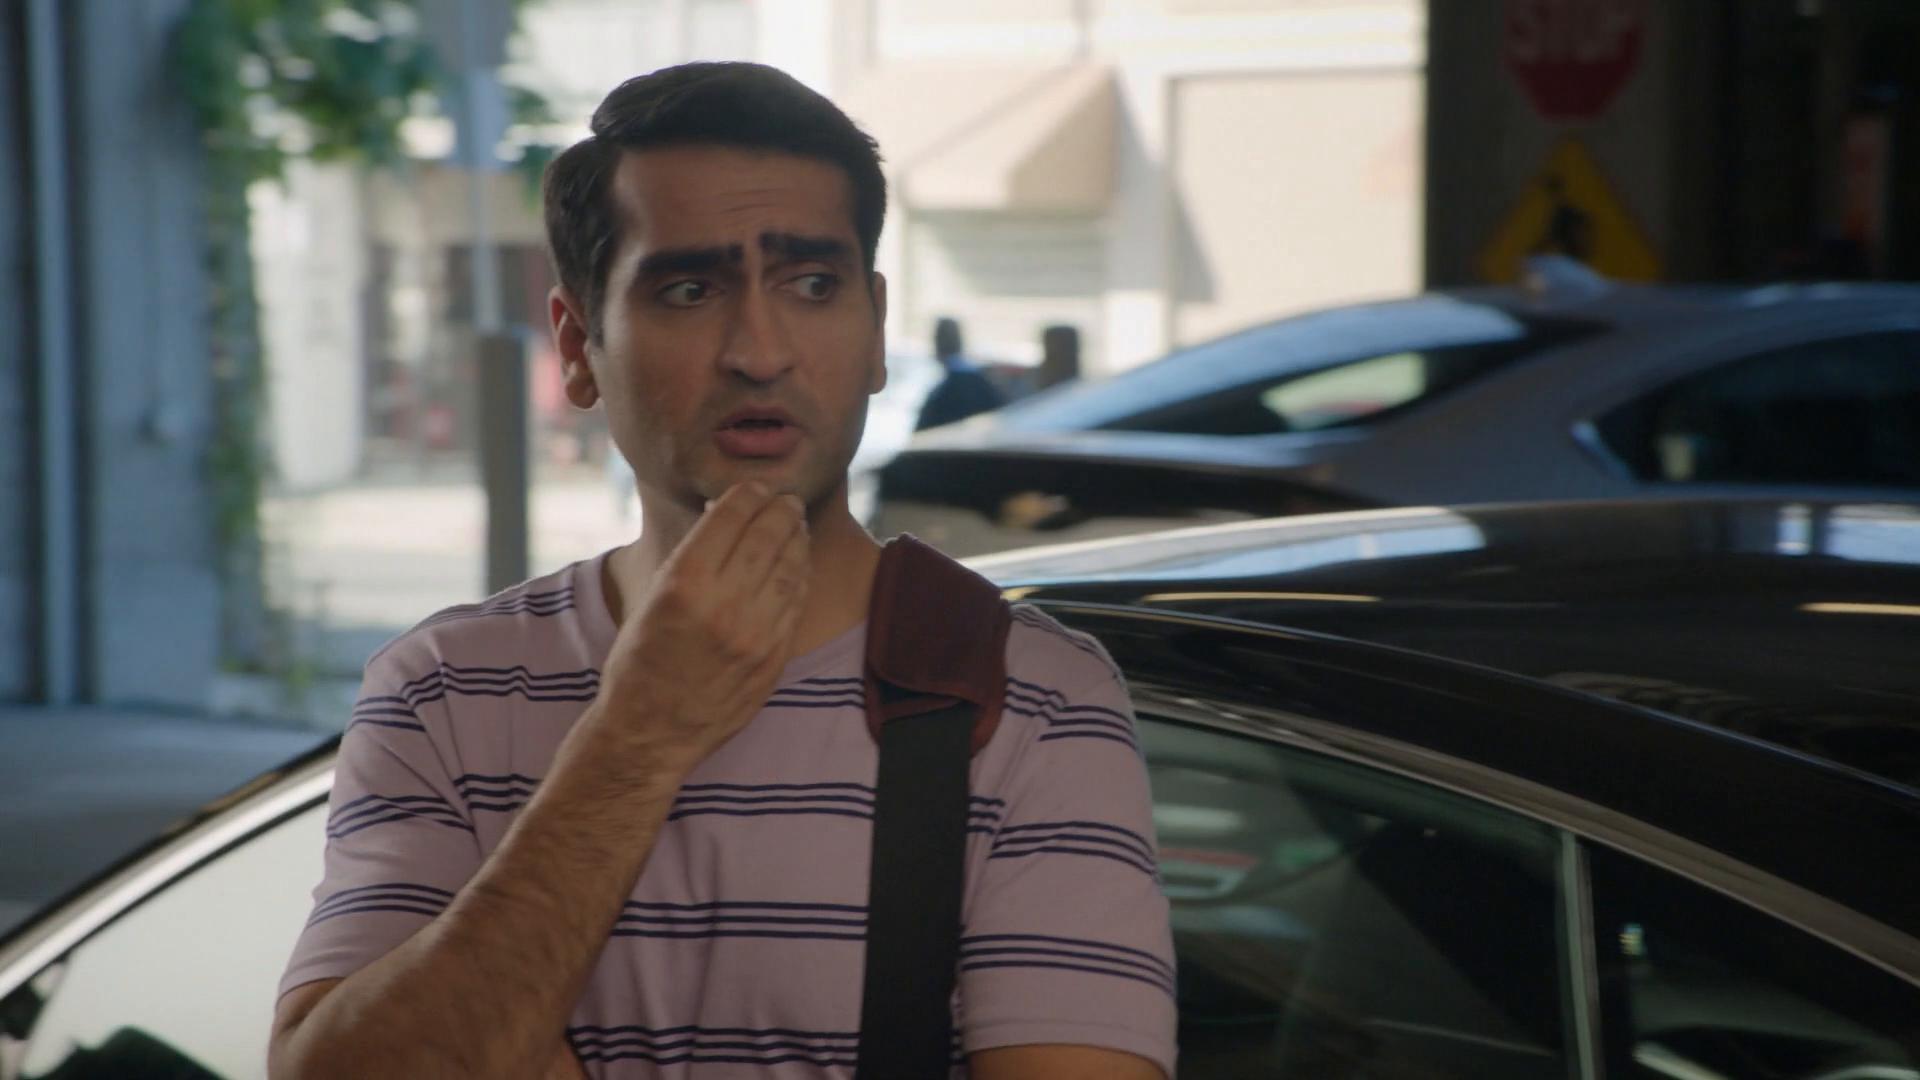 Silicon Valley S05E02 RERiP MULTi 1080p HDTV x264-HYBRiS